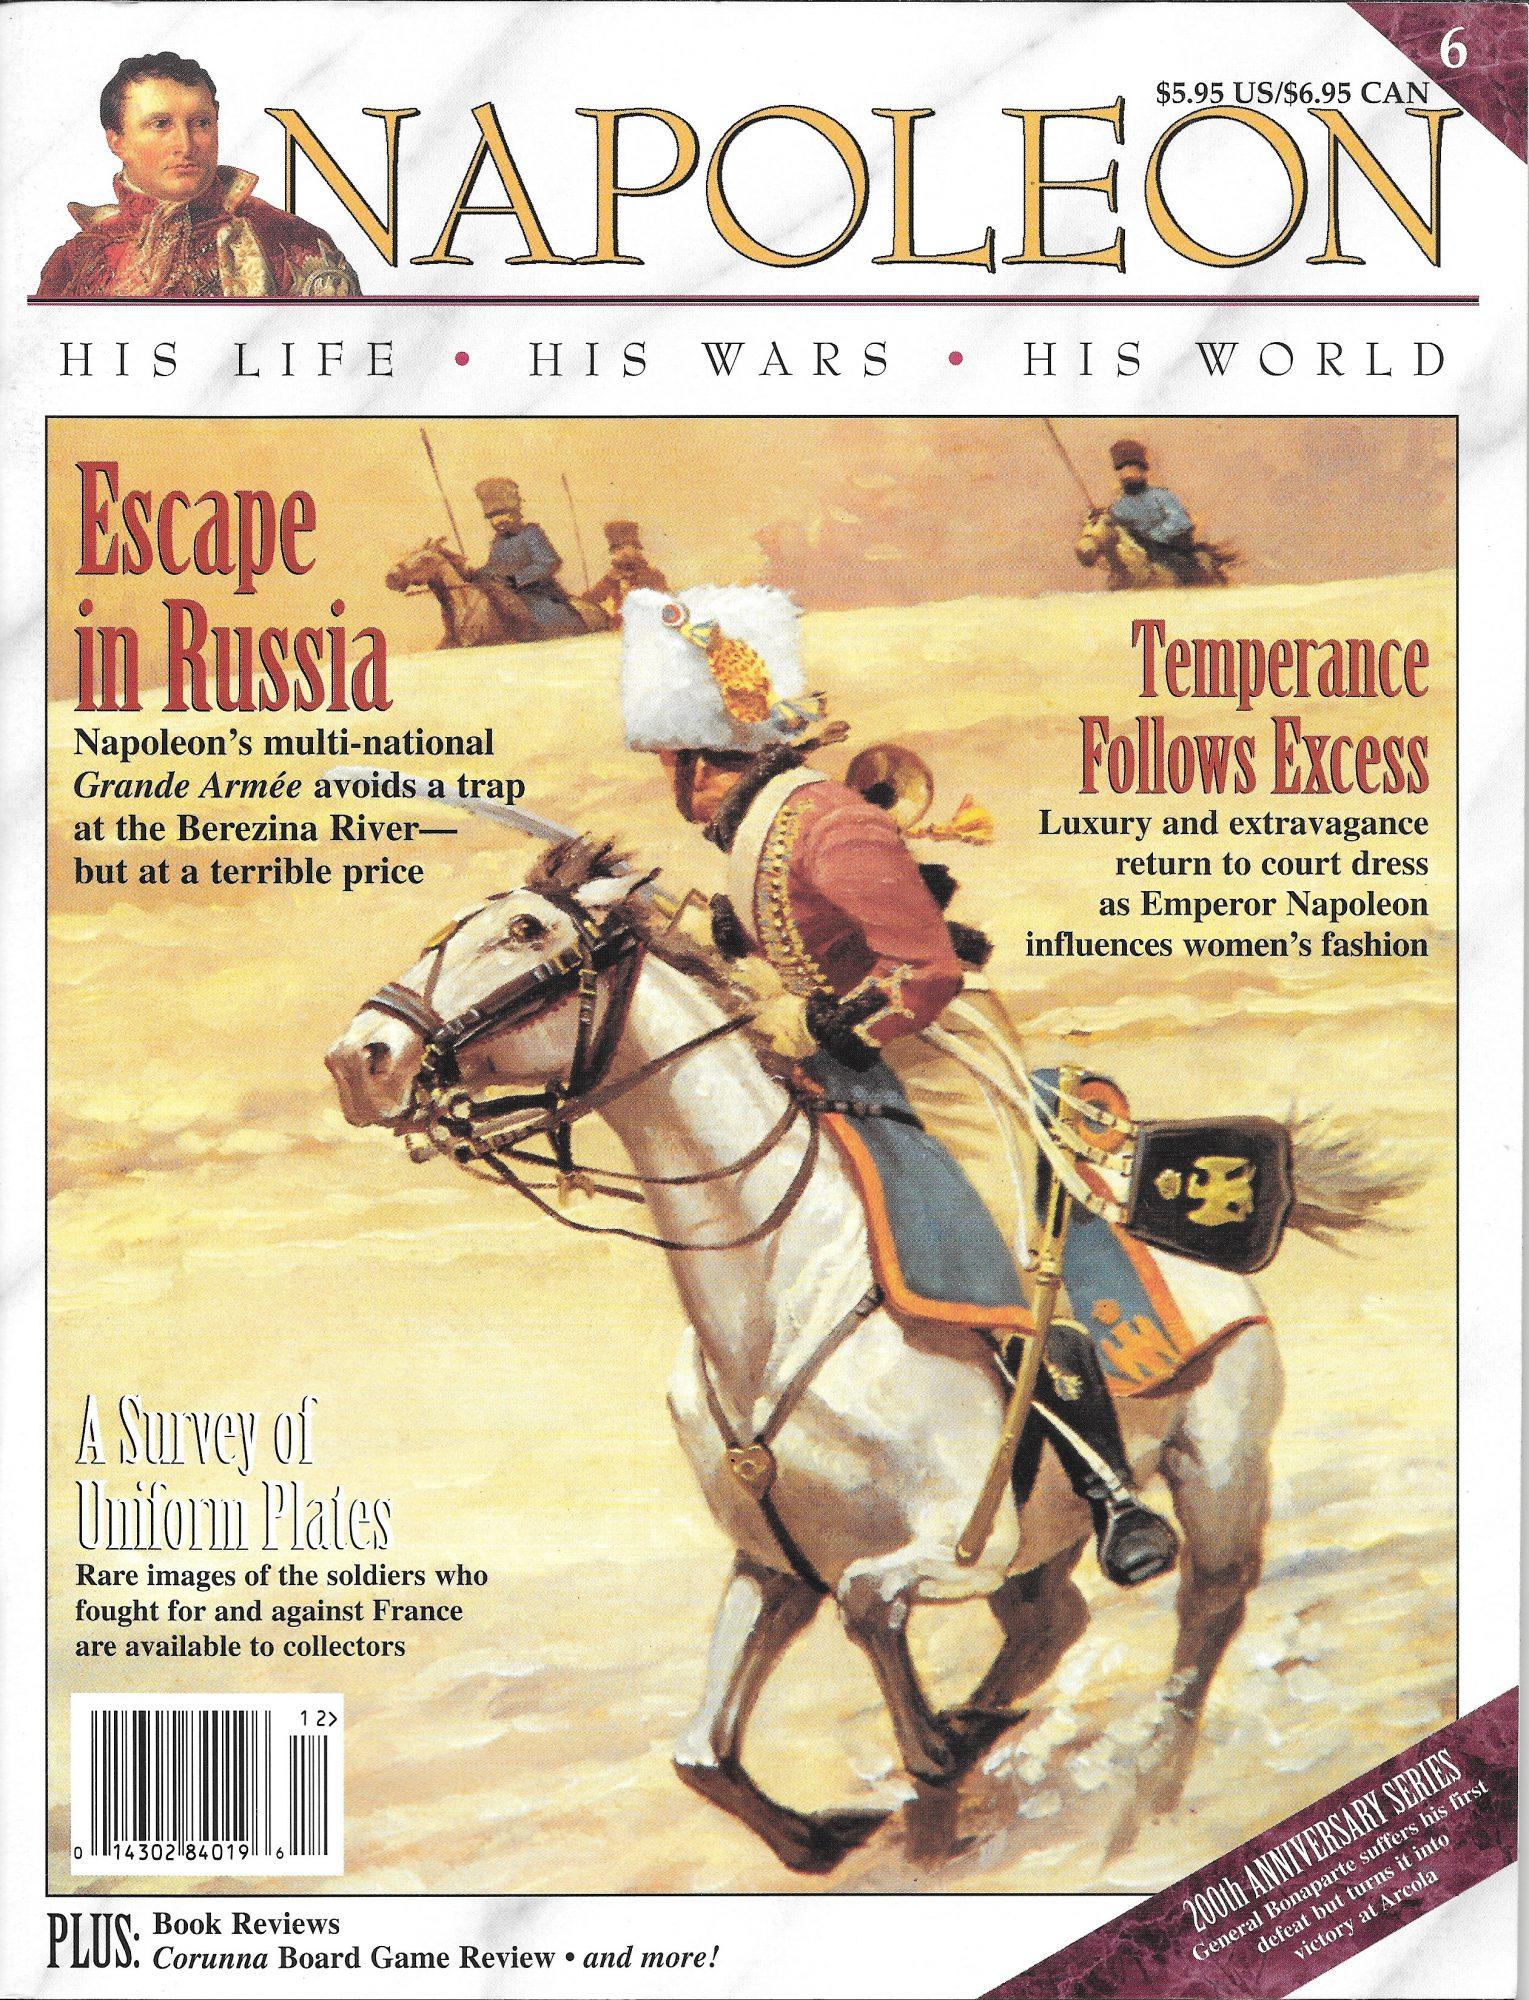 Napoleon issue #6 cover